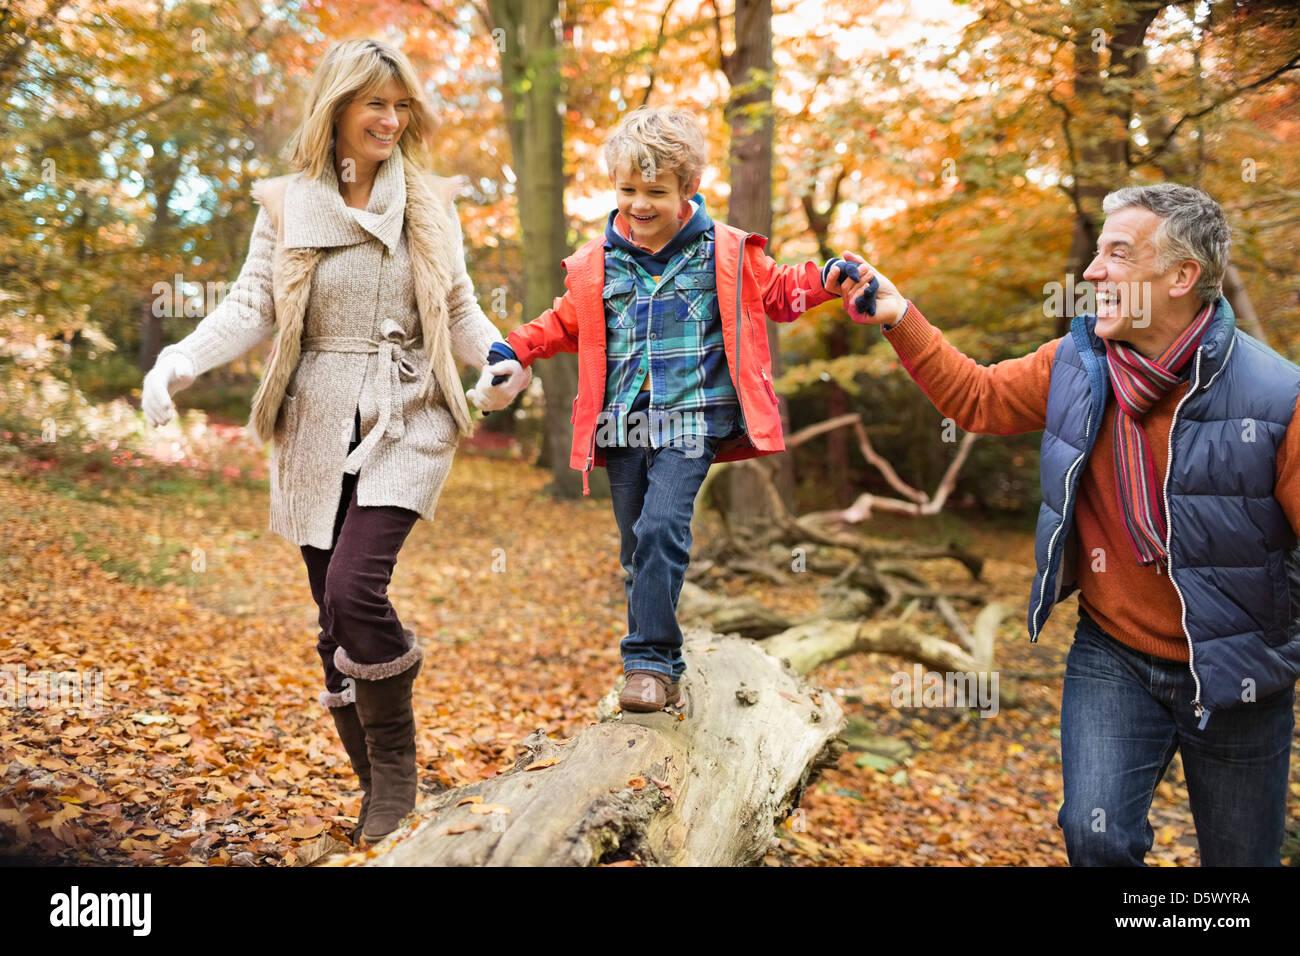 Family walking on log in park - Stock Image